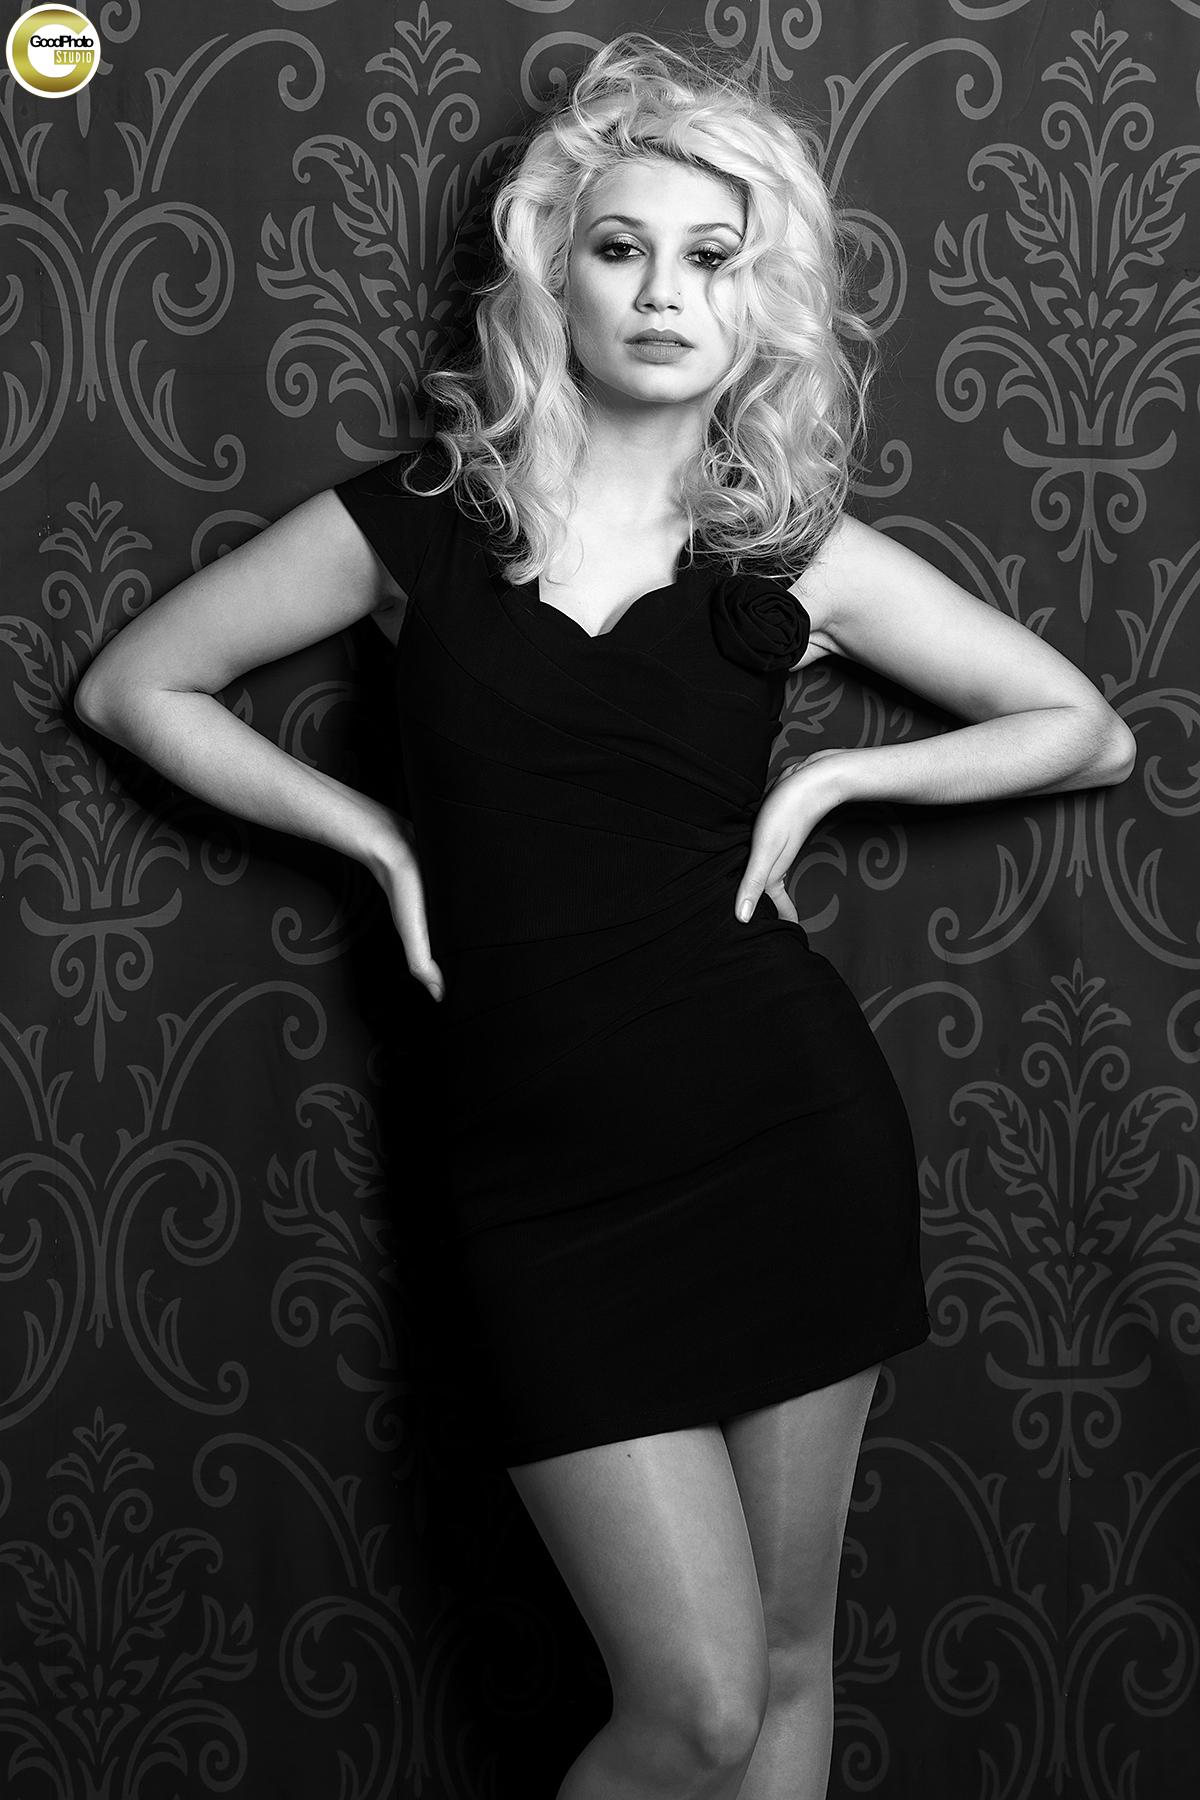 Model Kylie Kodydek